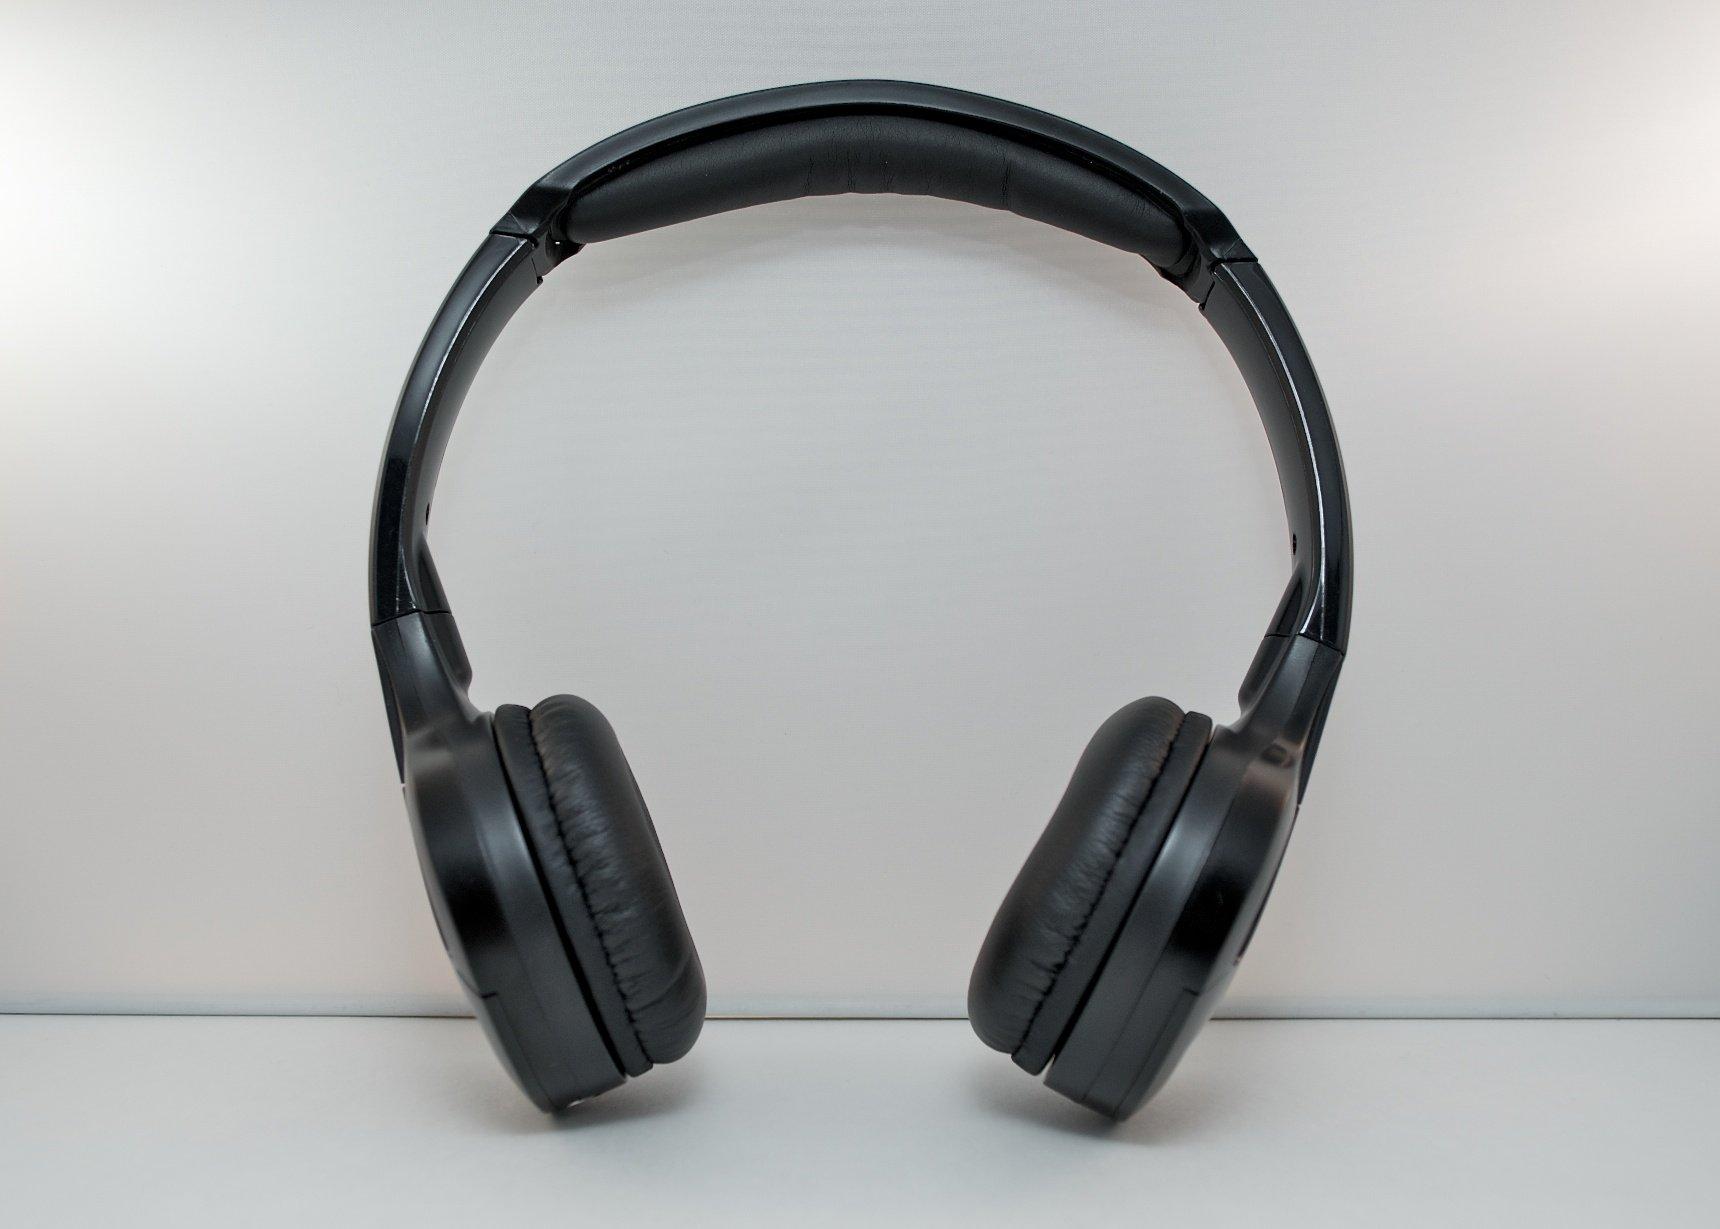 Chevrolet Suburban IR Wireless DVD Headphones Kids Headset (Black)